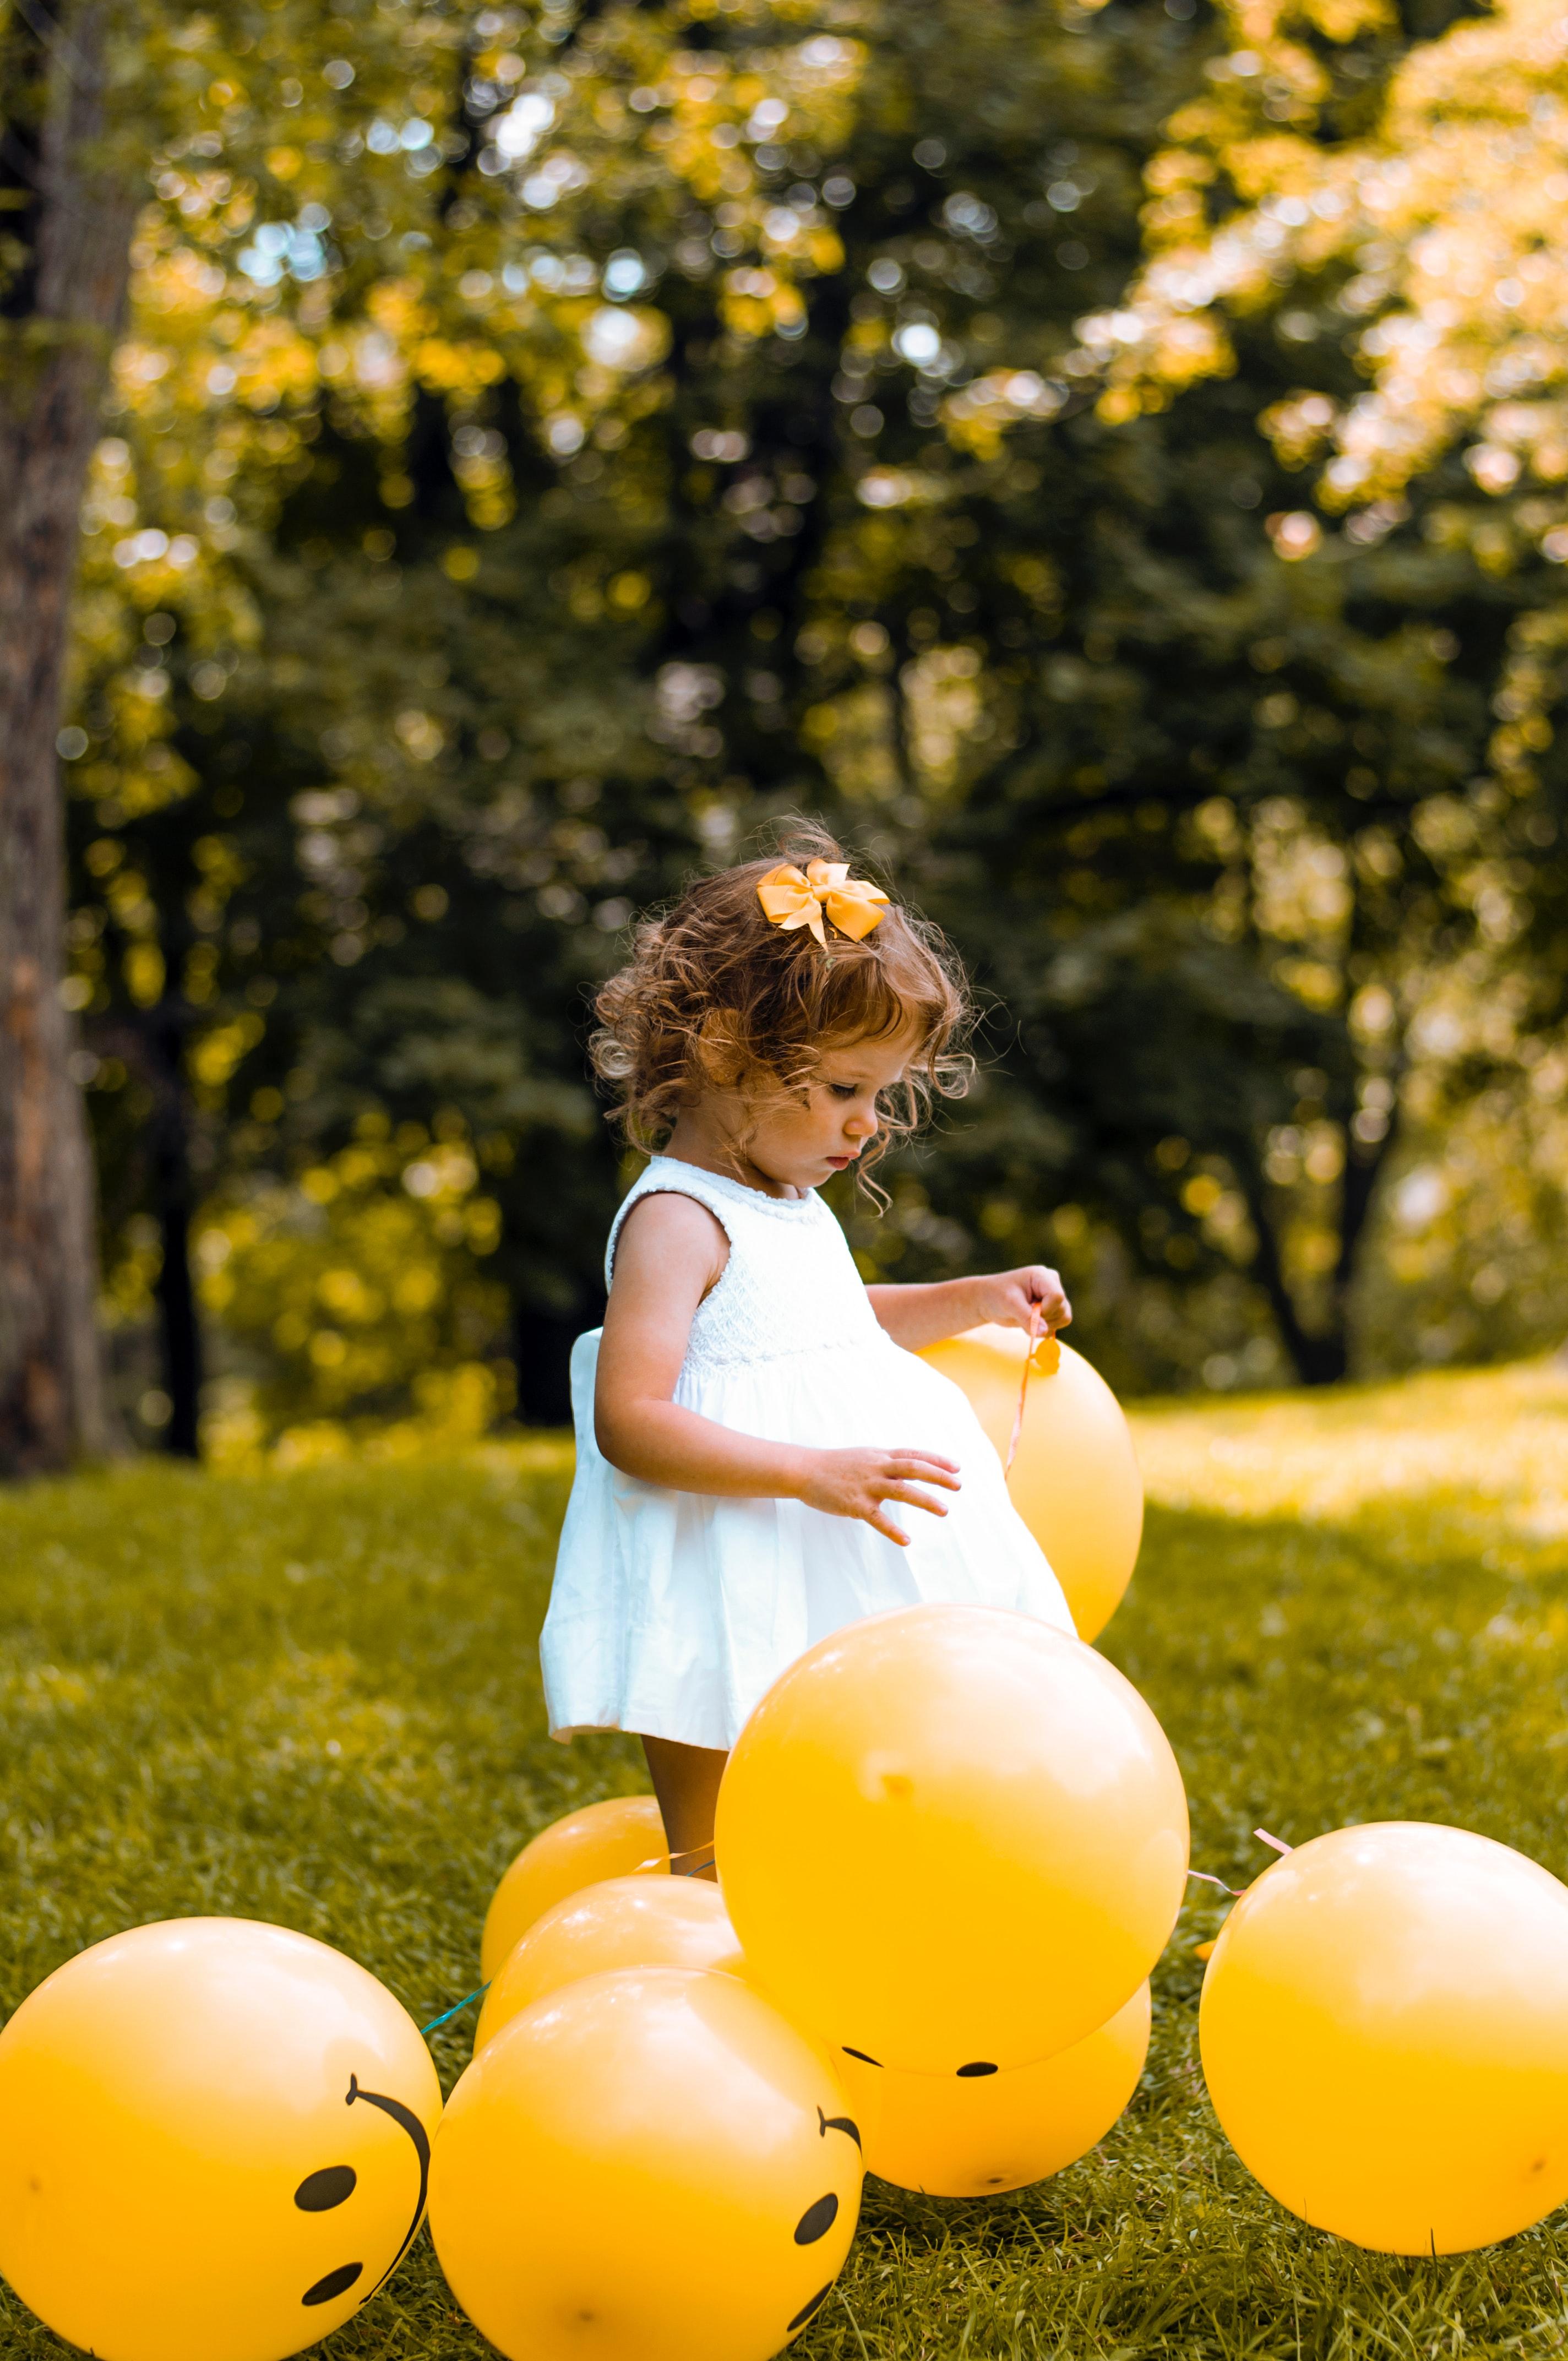 occuper les enfants lors d'un mariage